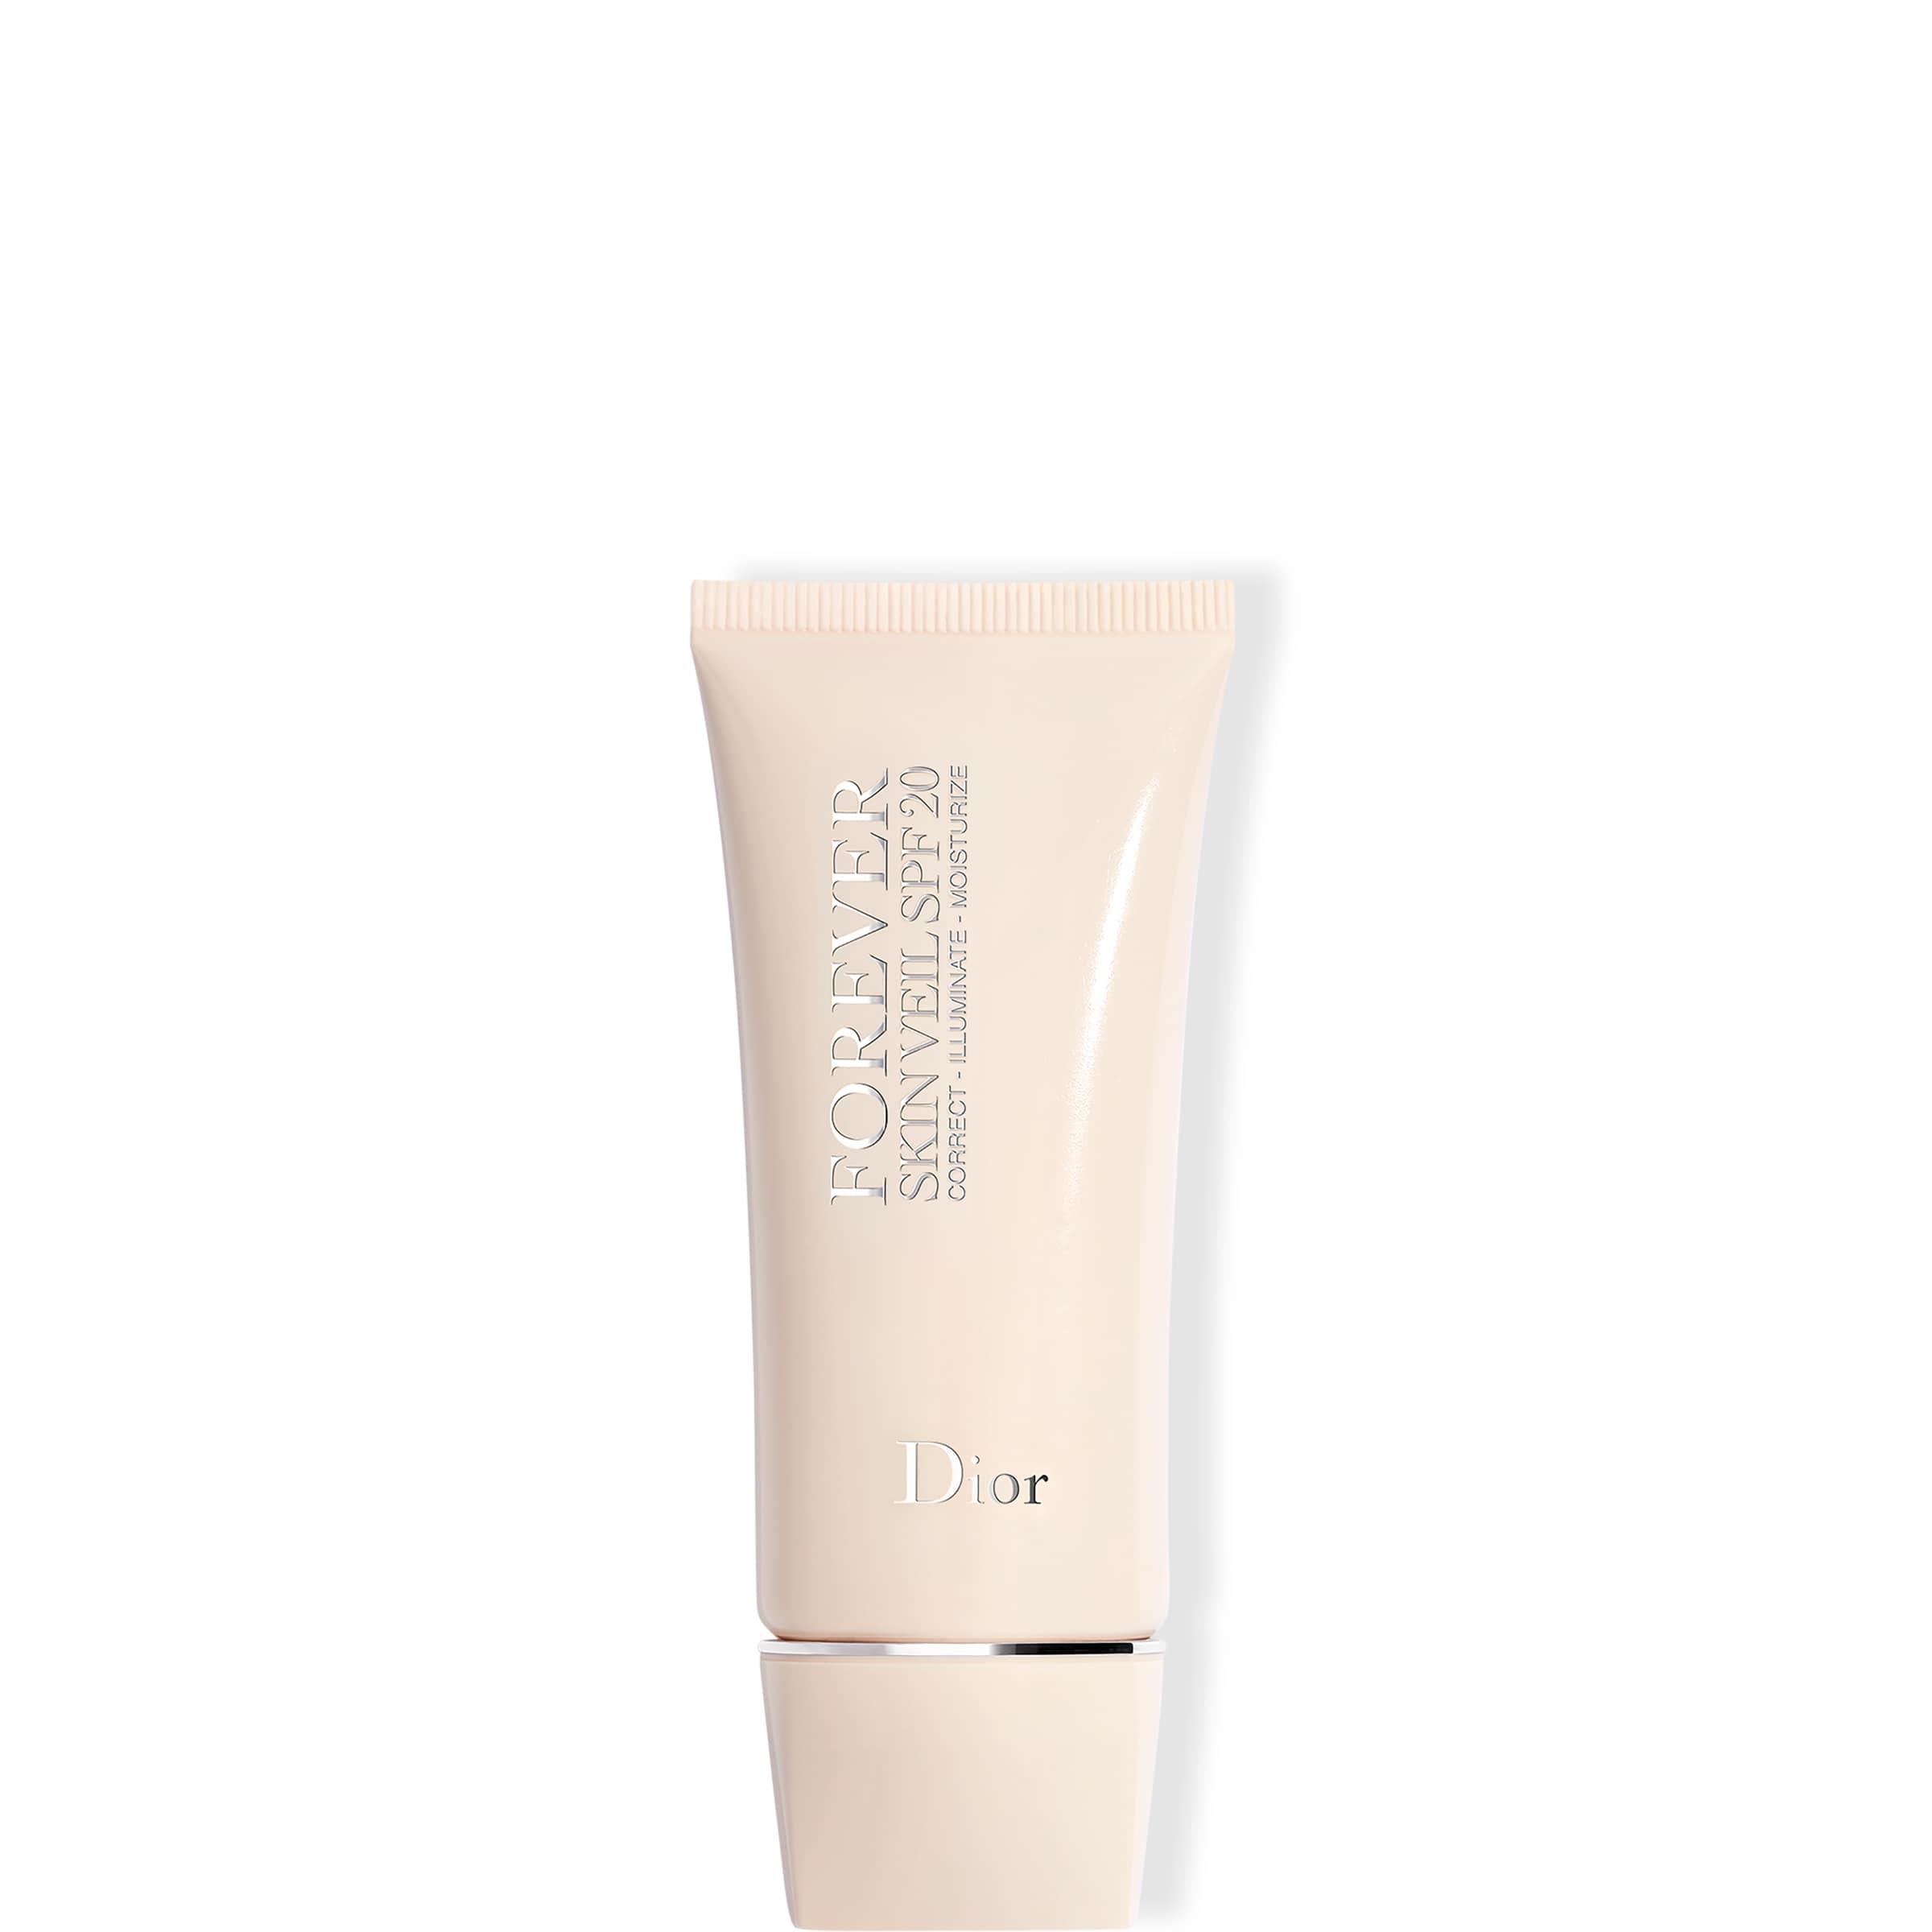 DIOR Dior Forever Skin Veil SPF20, 001